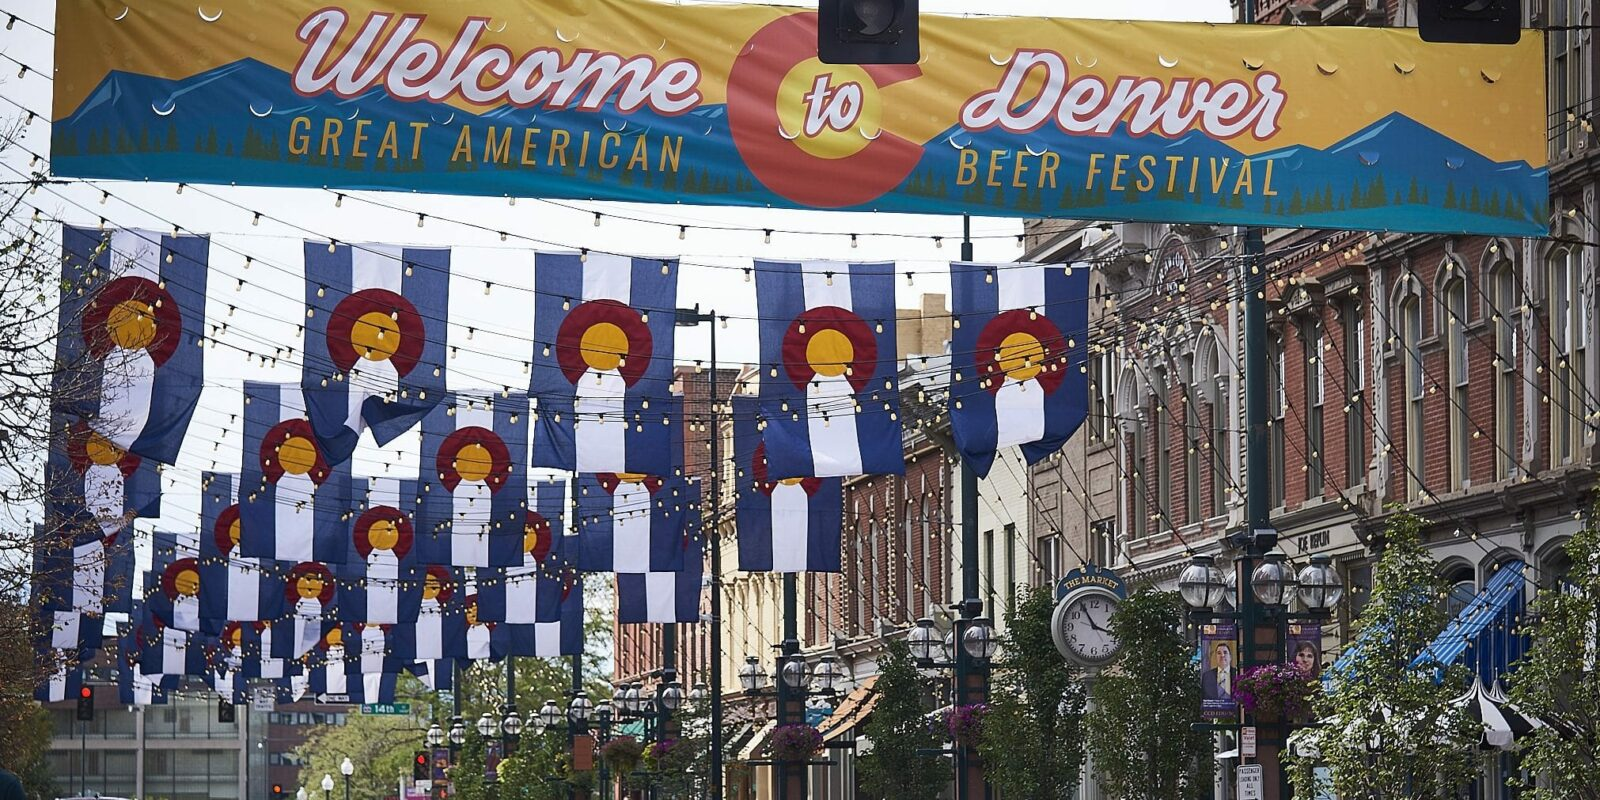 image of sign for great american beer festival denver